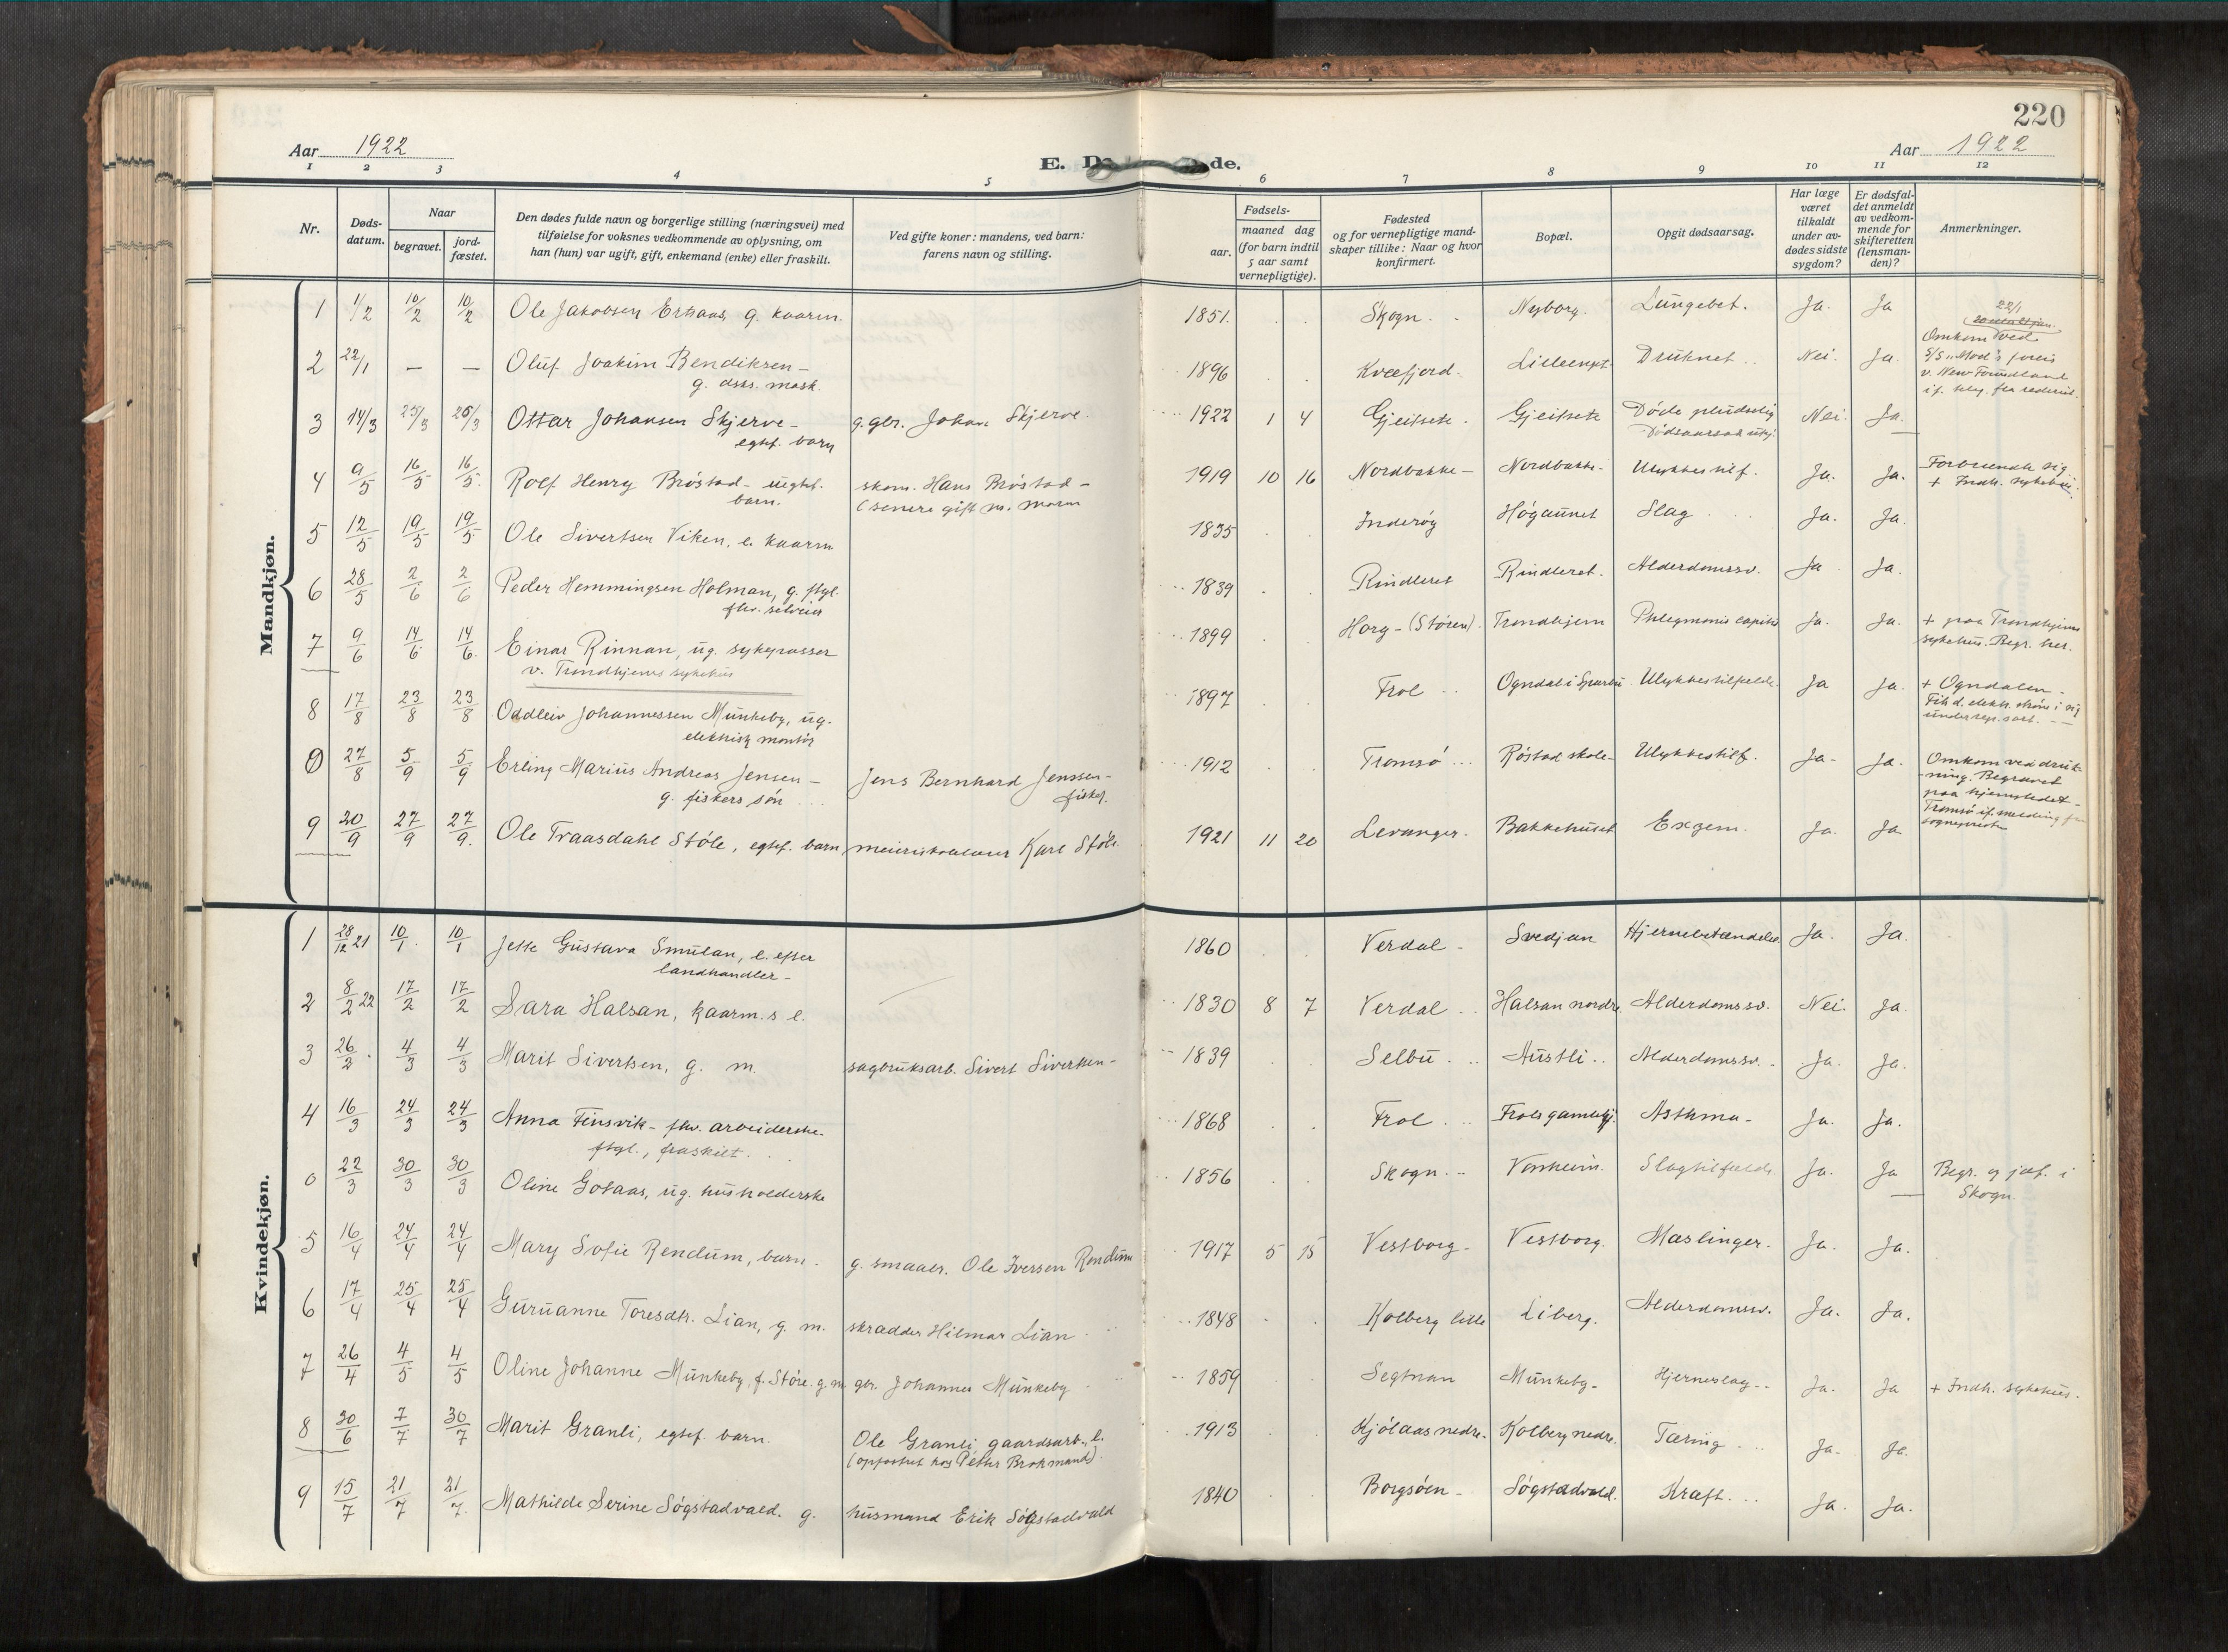 SAT, Levanger sokneprestkontor*, Parish register (official) no. 1, 1912-1935, p. 220